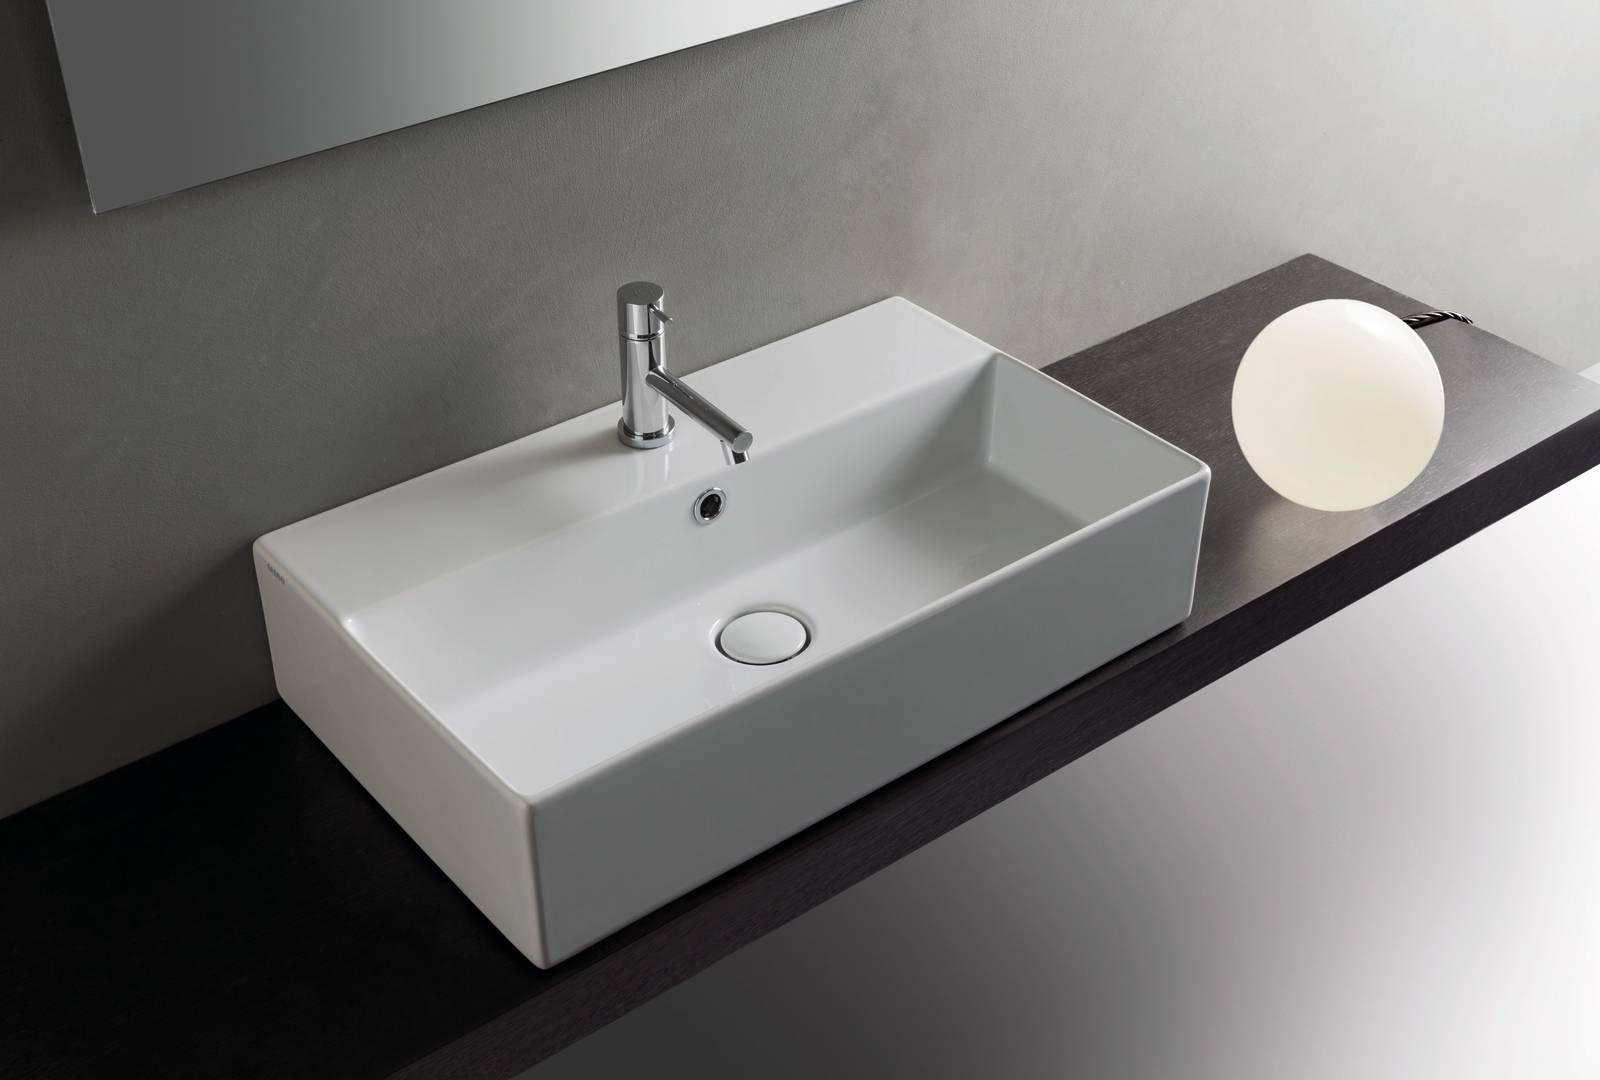 Outlet sanitari collezione concept a terra ceramica globo mario